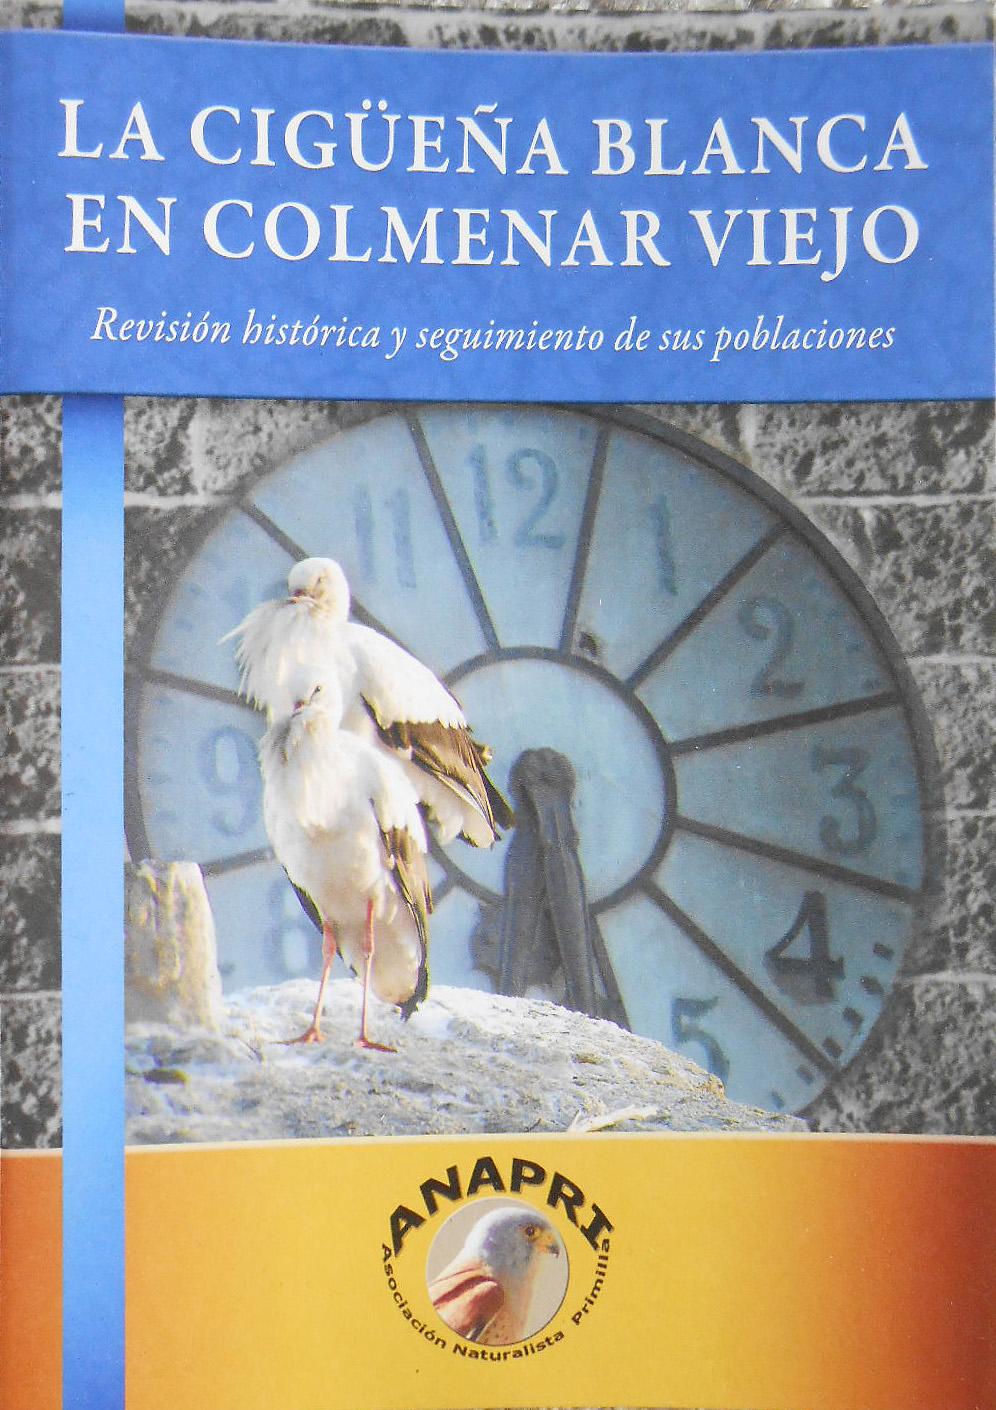 Revisión histórica Cigüeña blanca